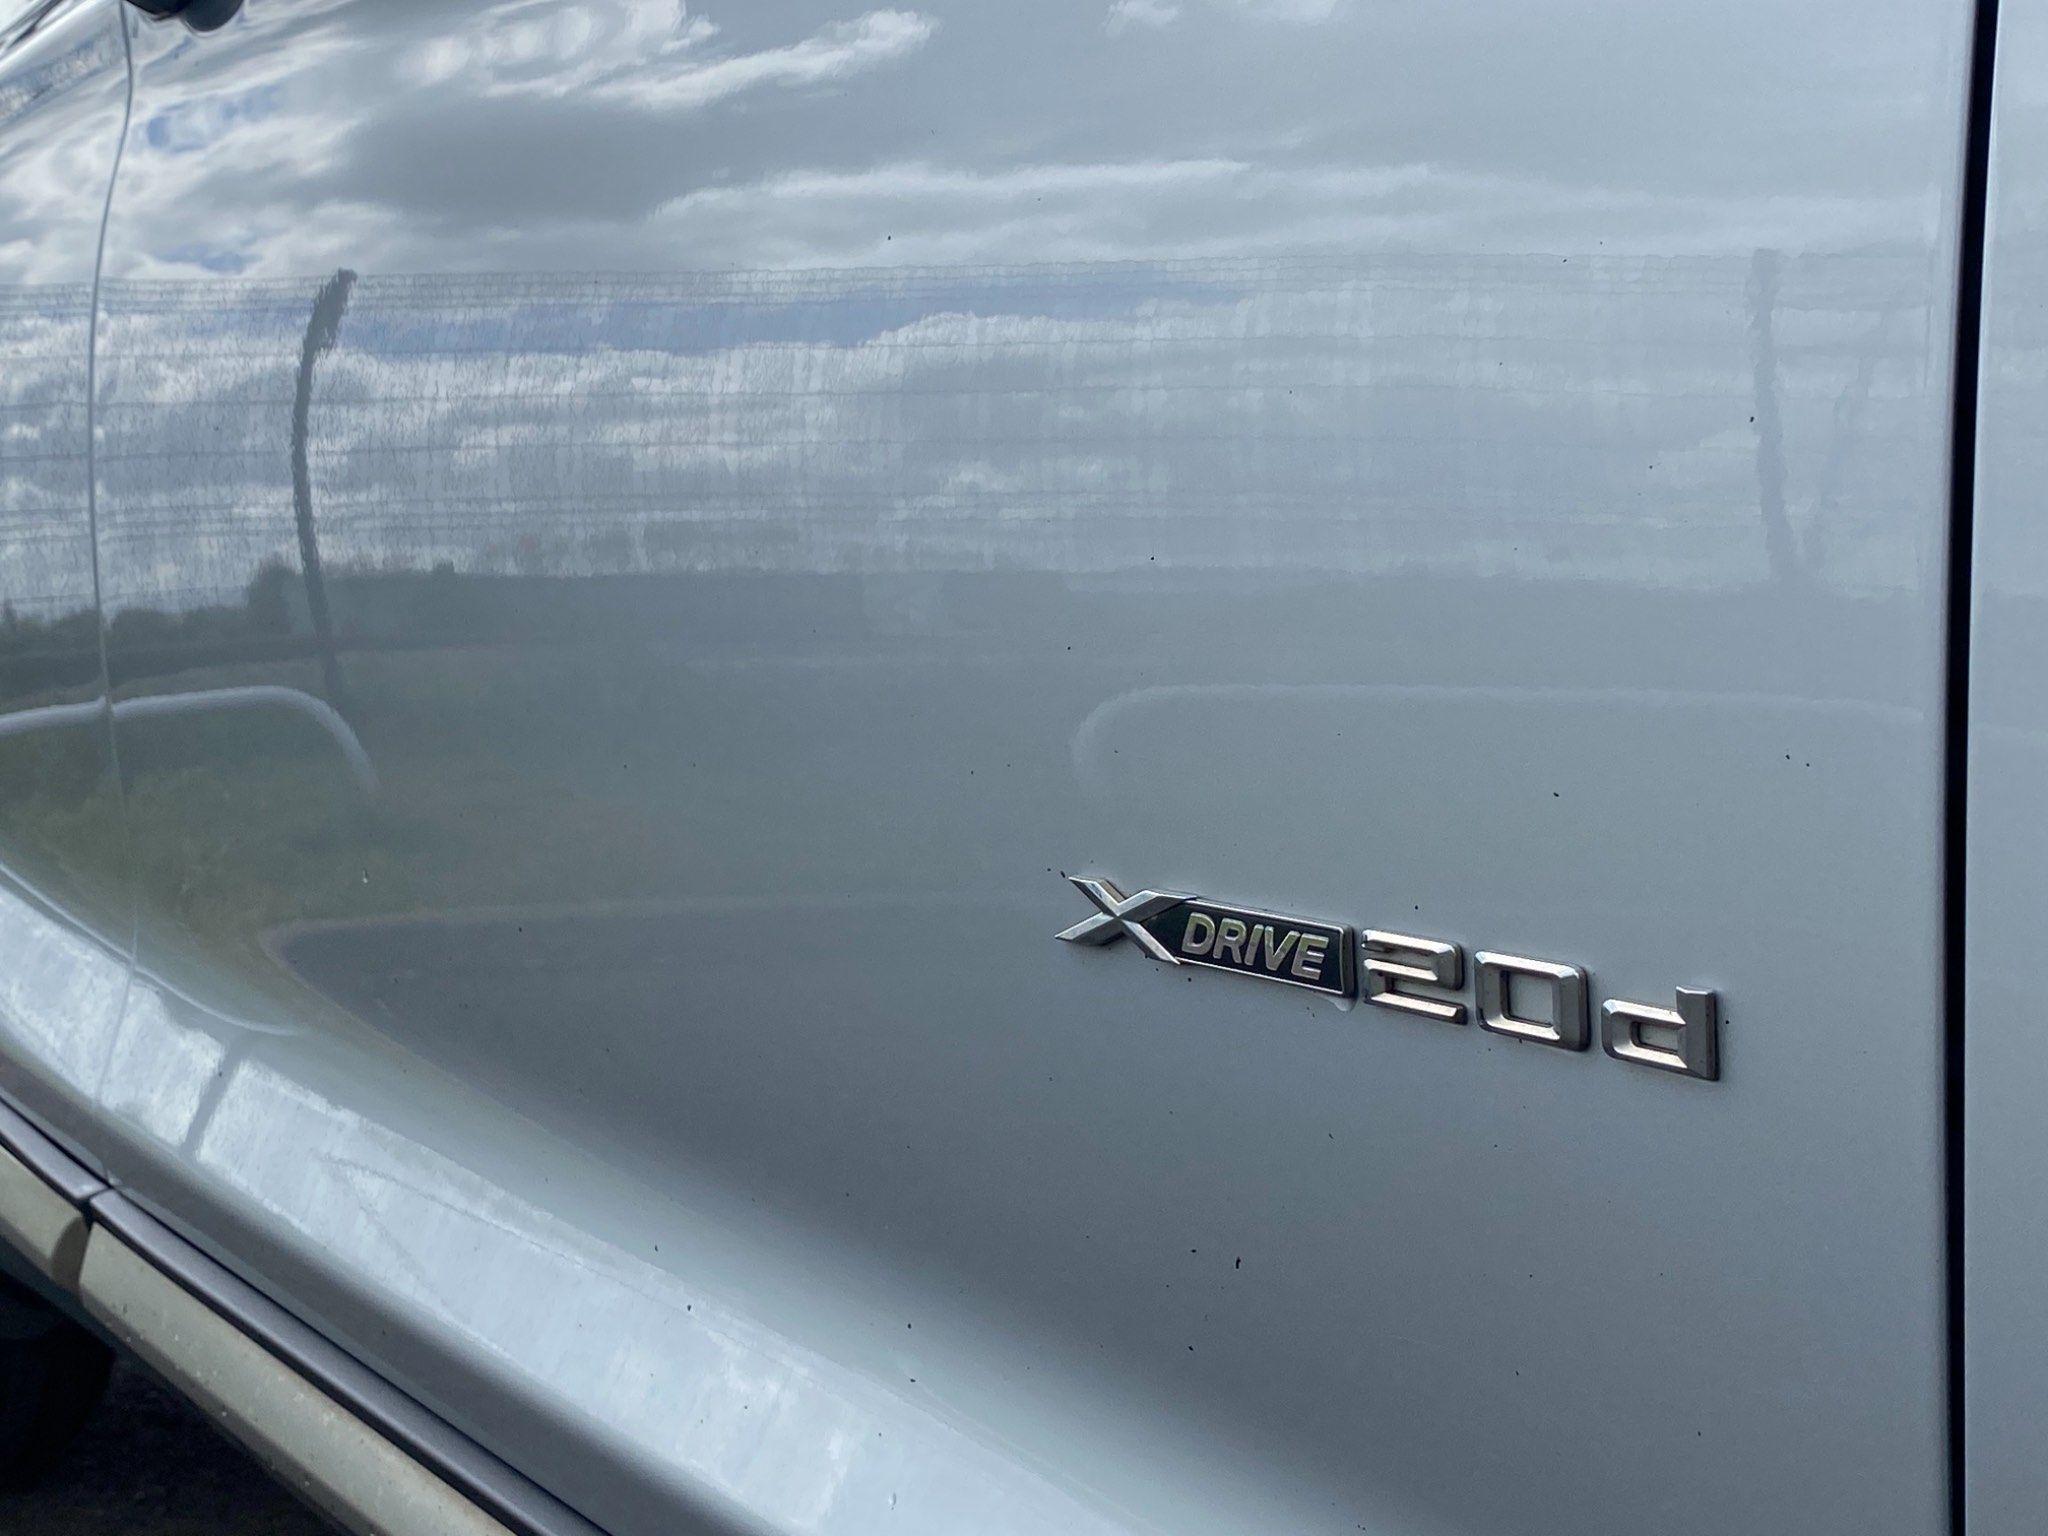 BMW X3 Images